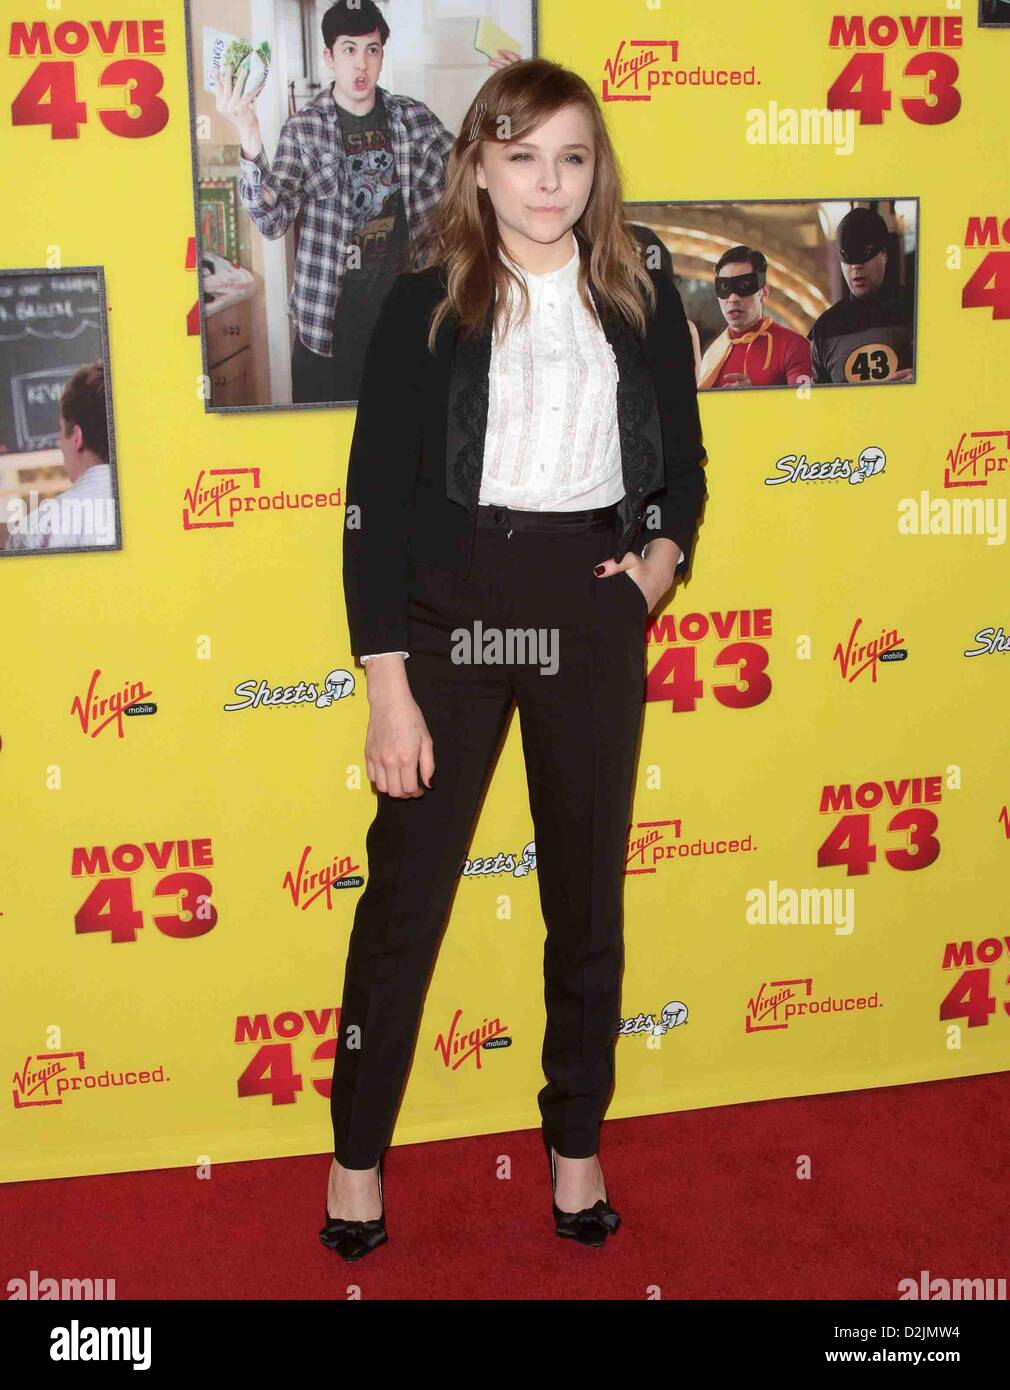 CHLOE GRACE MORETZ PREMIERE OF MOVIE 43 LOS ANGELES CALIFORNIA USA 23 January 2013 - Stock Image